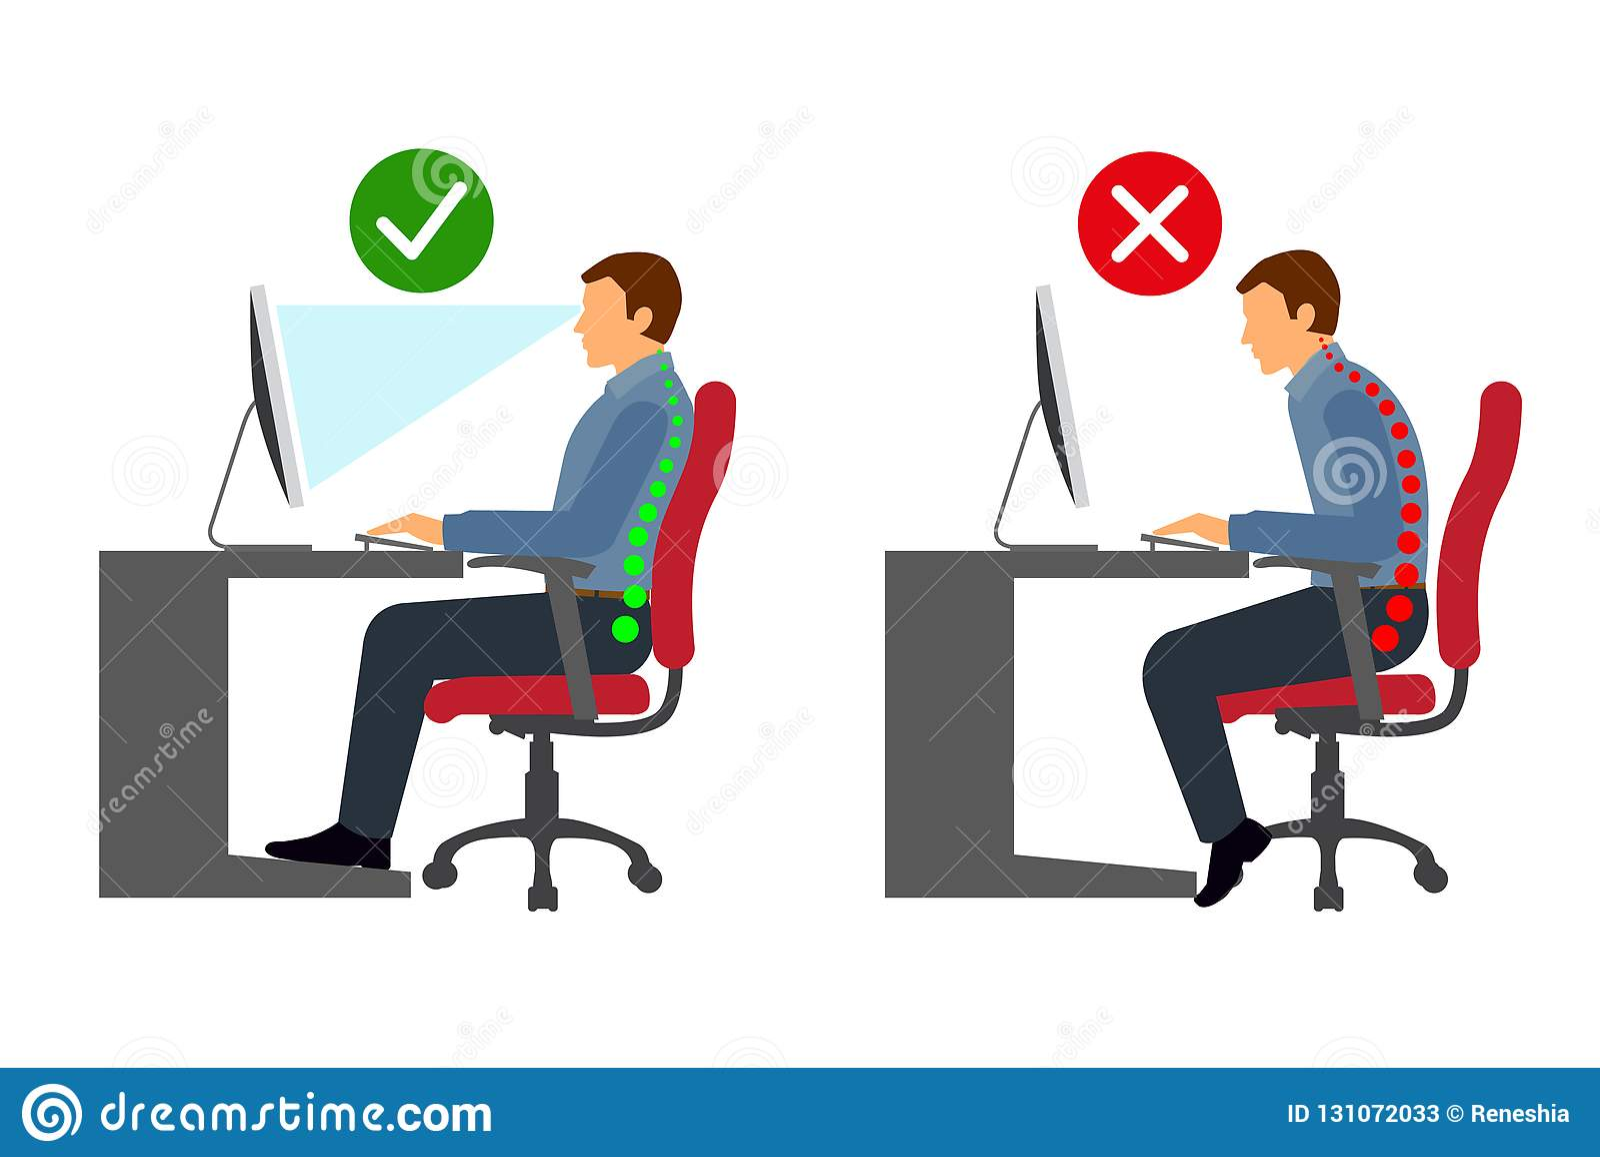 Office Safety Skills Worksheet